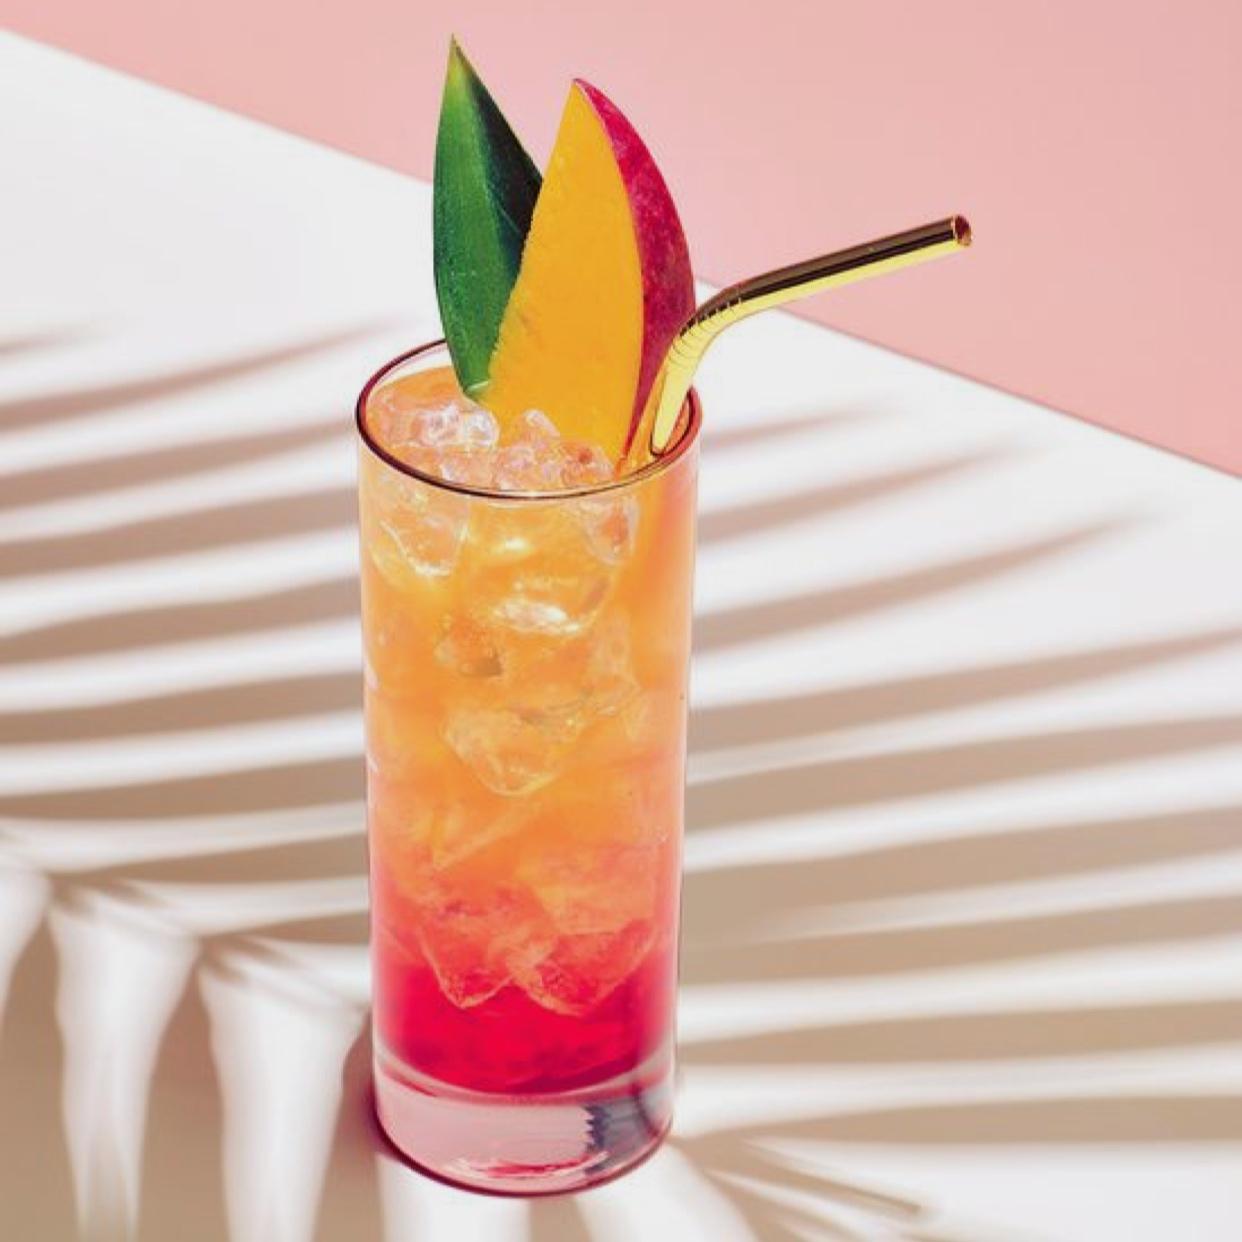 fa-fa-fa-fa Friday - $2 offCraft cocktails | specialty martinis | Lindy's Classics$4 shotsJack Fire | Jameson | Rumple minze